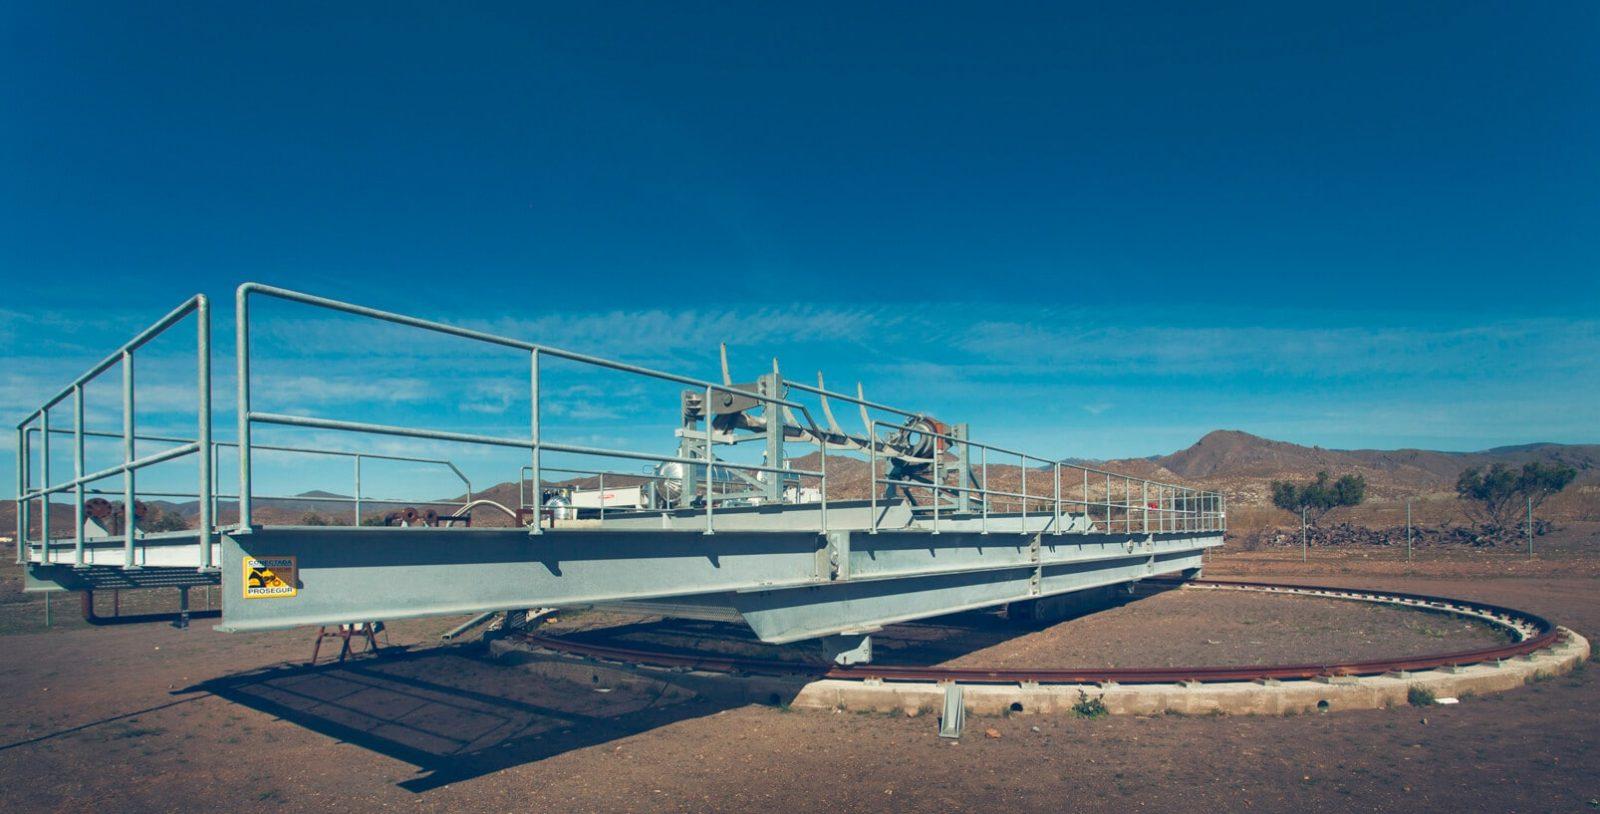 CTAER_Solar_Parabollic_Through_Collectors_Test_Platform_Alemara_ADA_IDOM_Alfonso_Calza__4_